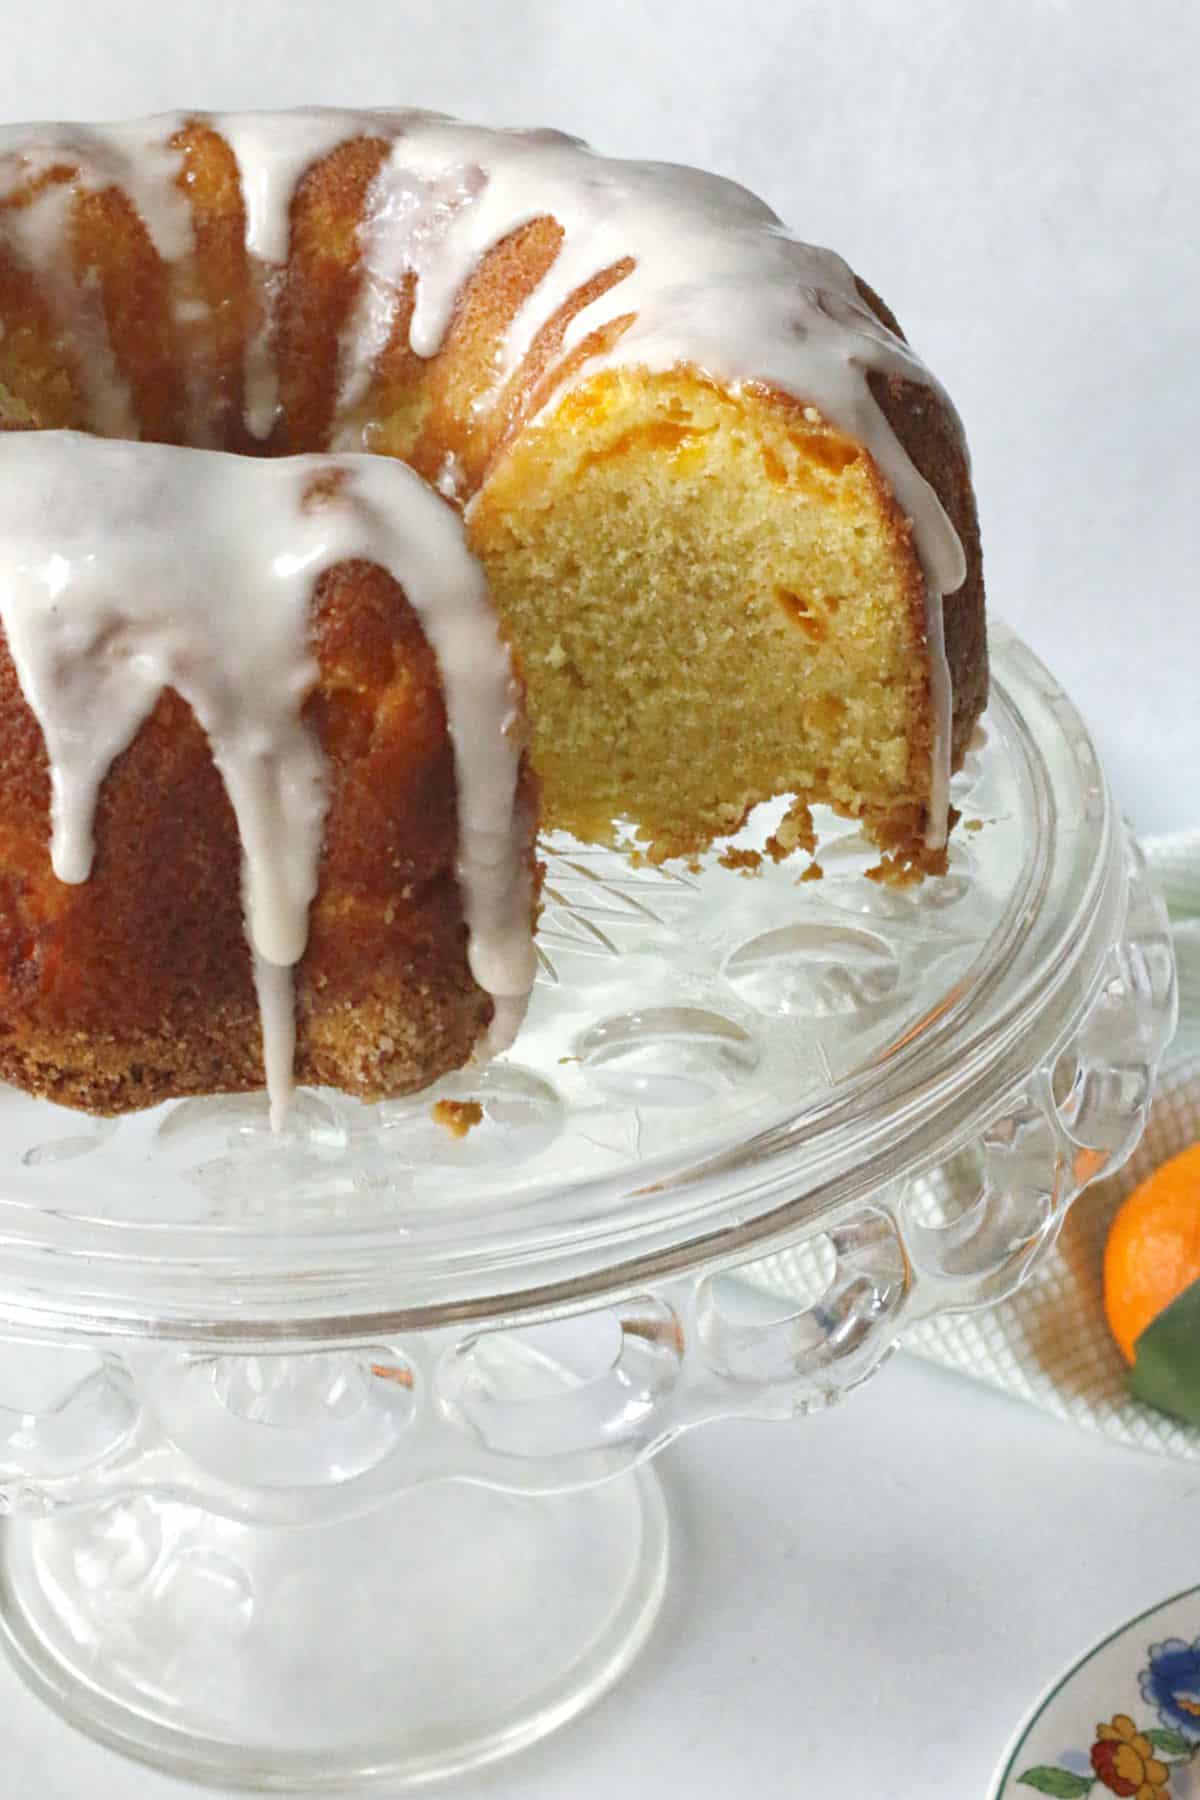 A mandarin orange cake on a cake stand.